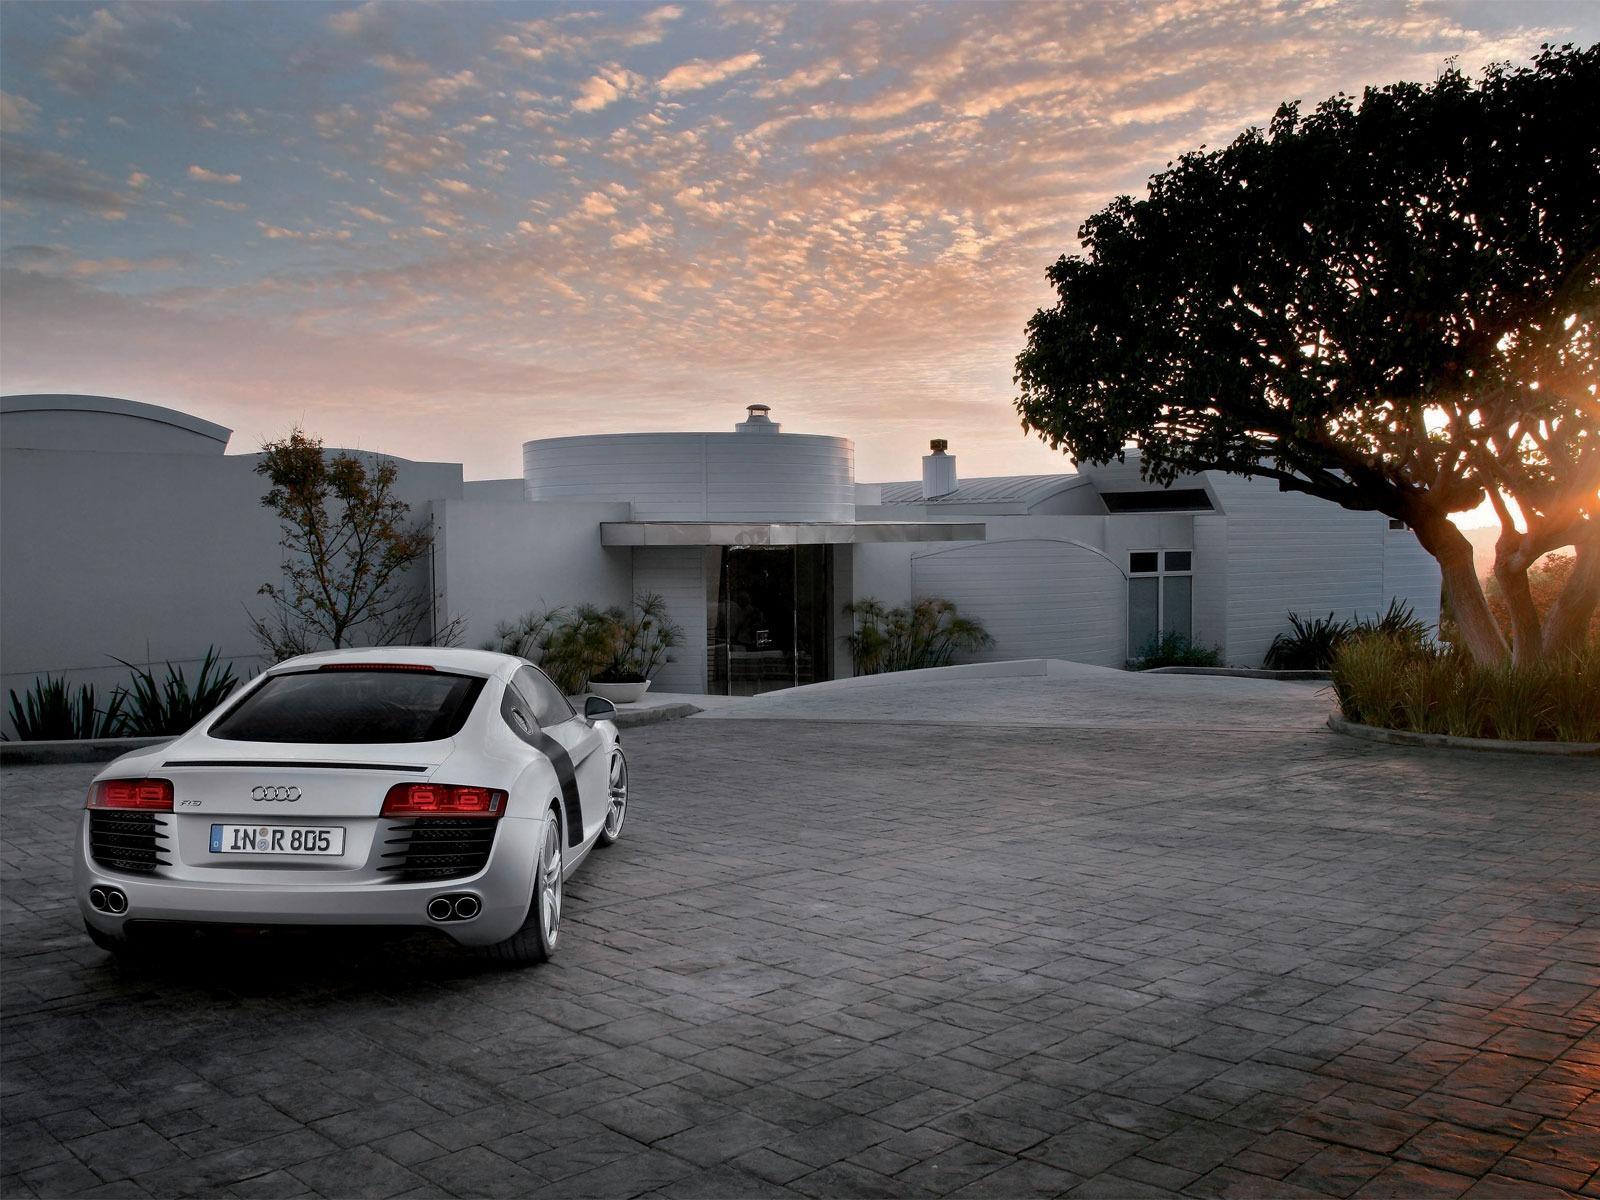 Audi A6 3d Wallpaper Audi R8 Landscape Wallpaper Audi Cars Wallpapers In Jpg